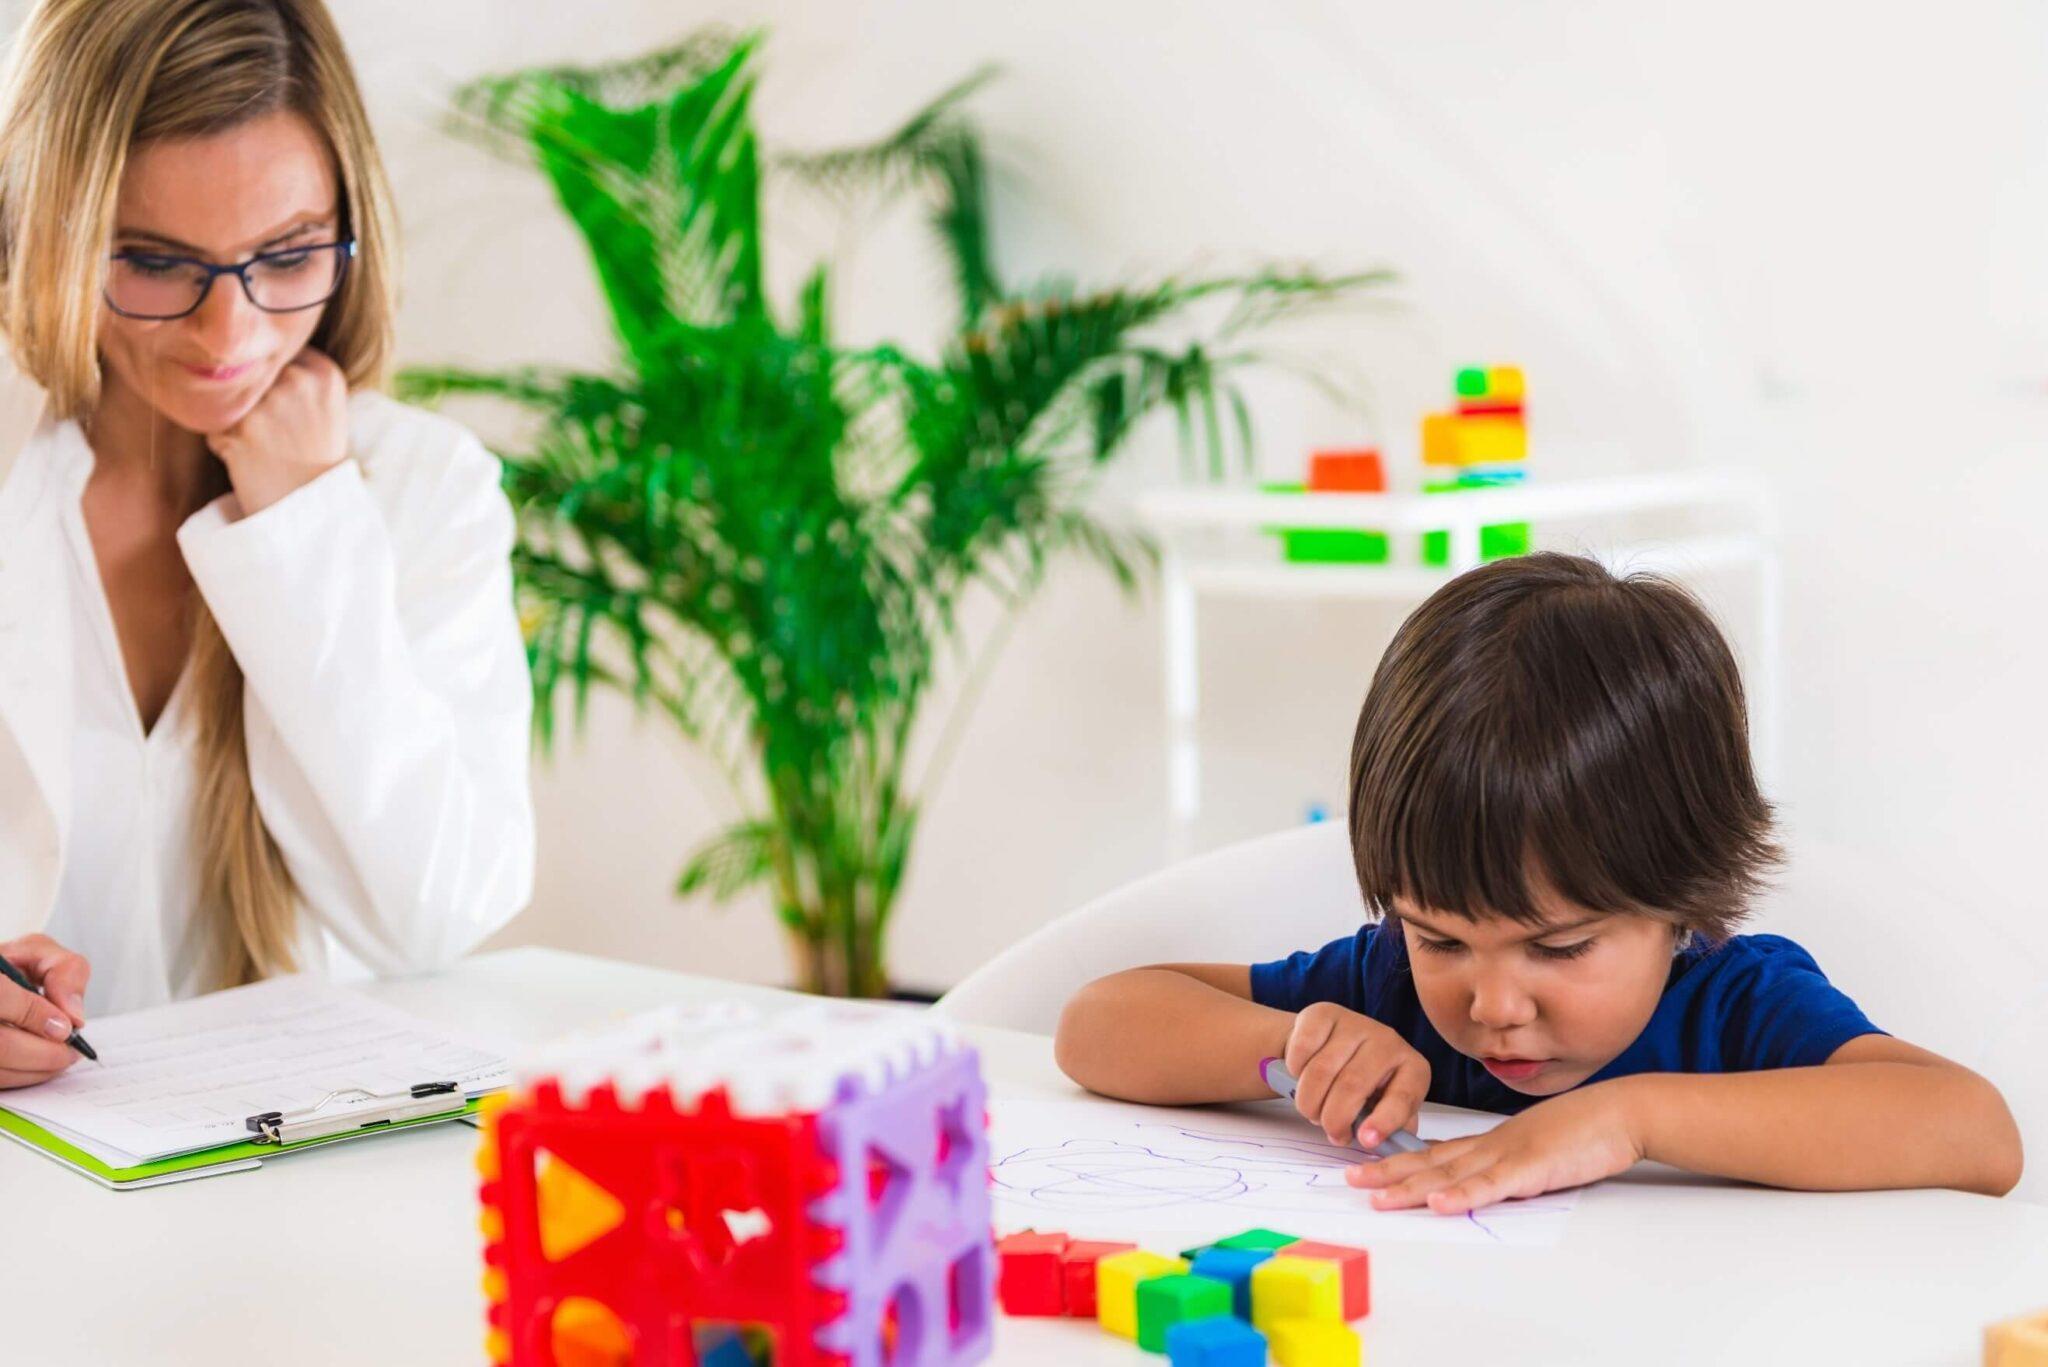 clínica de psicologia infantil - criança na terapia